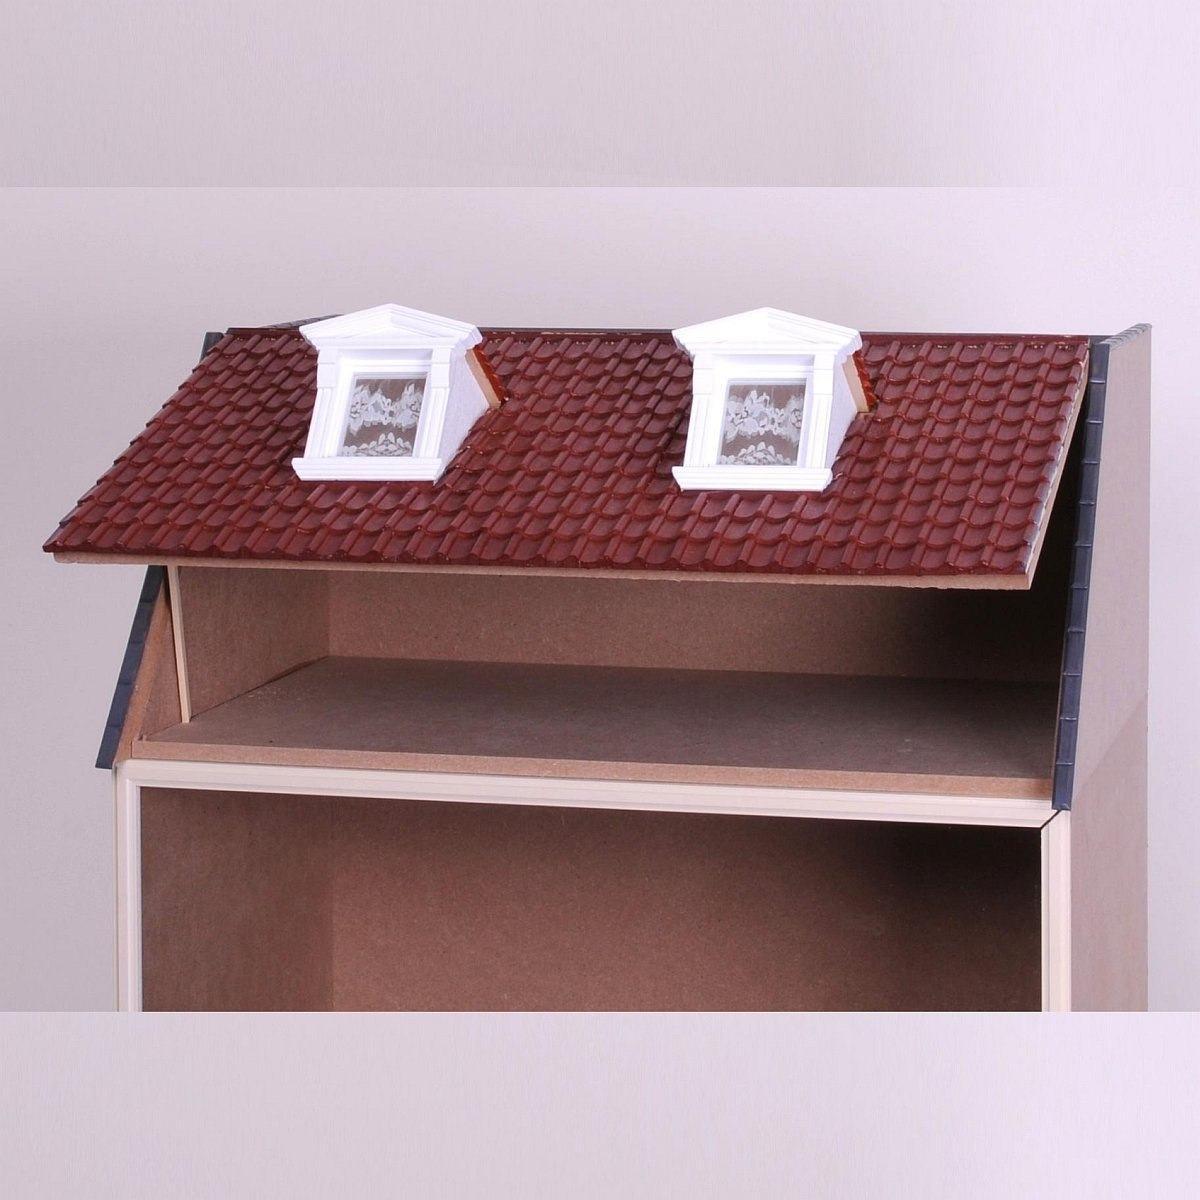 Attic floor for the Module Box